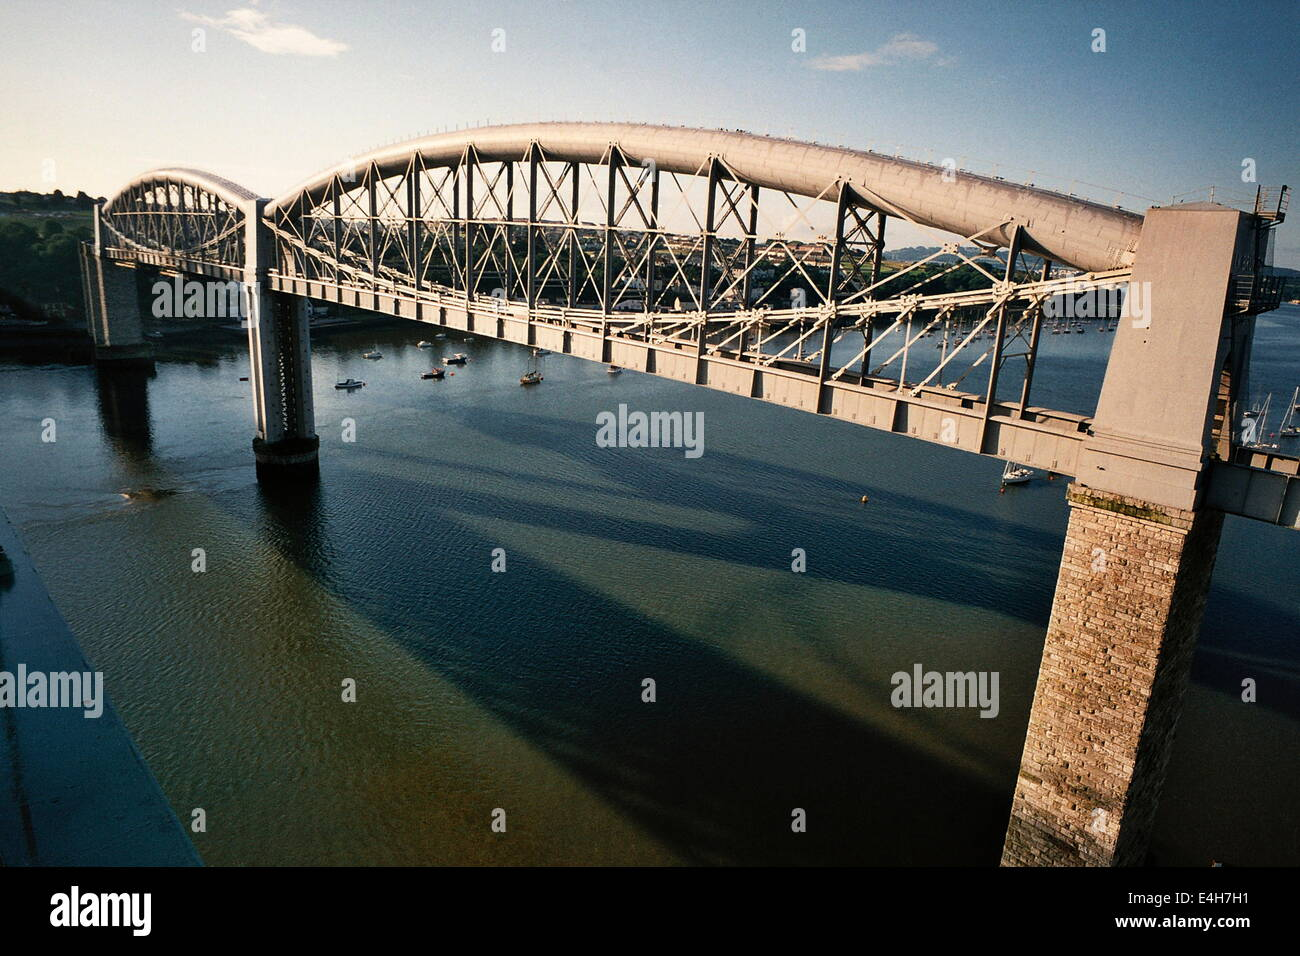 PLYMOUTH,ENGLAND.BRUNEL'S RAILWAY BRIDGE CROSSING THE TAMAR RIVER.PHOTO:JONATHAN EASTLAND/AJAX Stock Photo